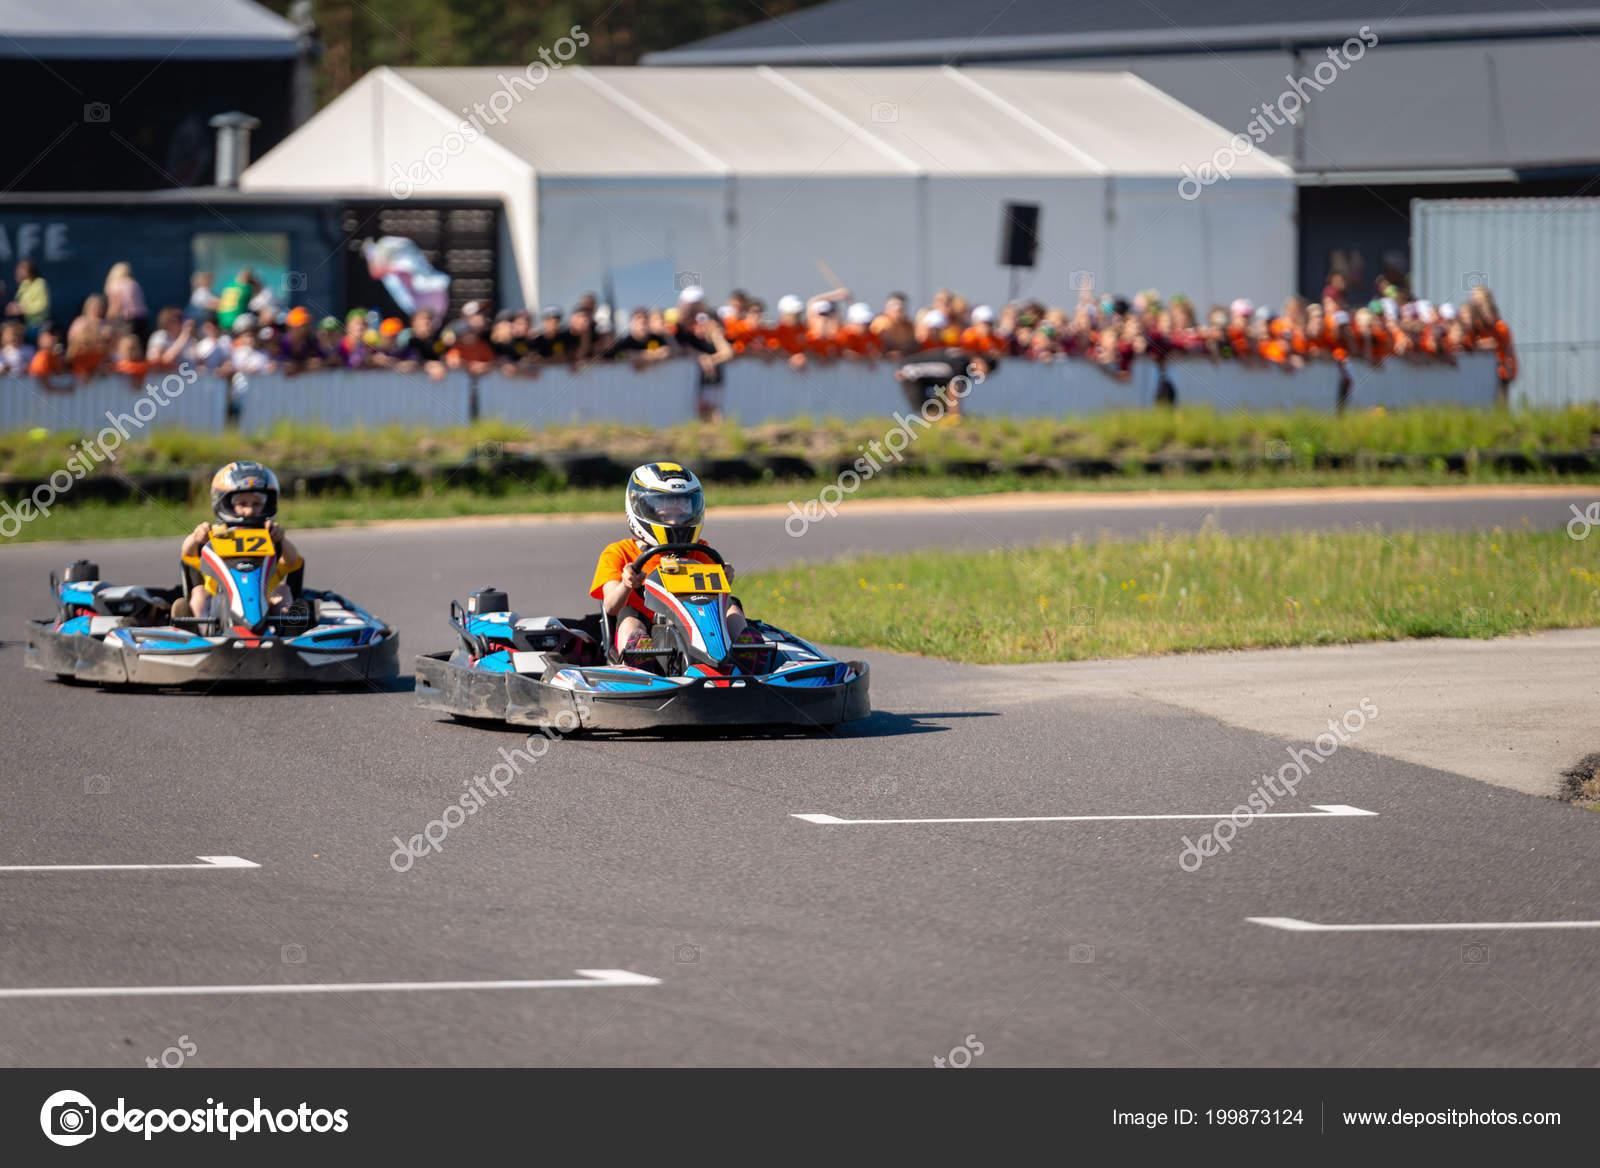 Ropazi Latvia May 2018 Student Sports Games Championship